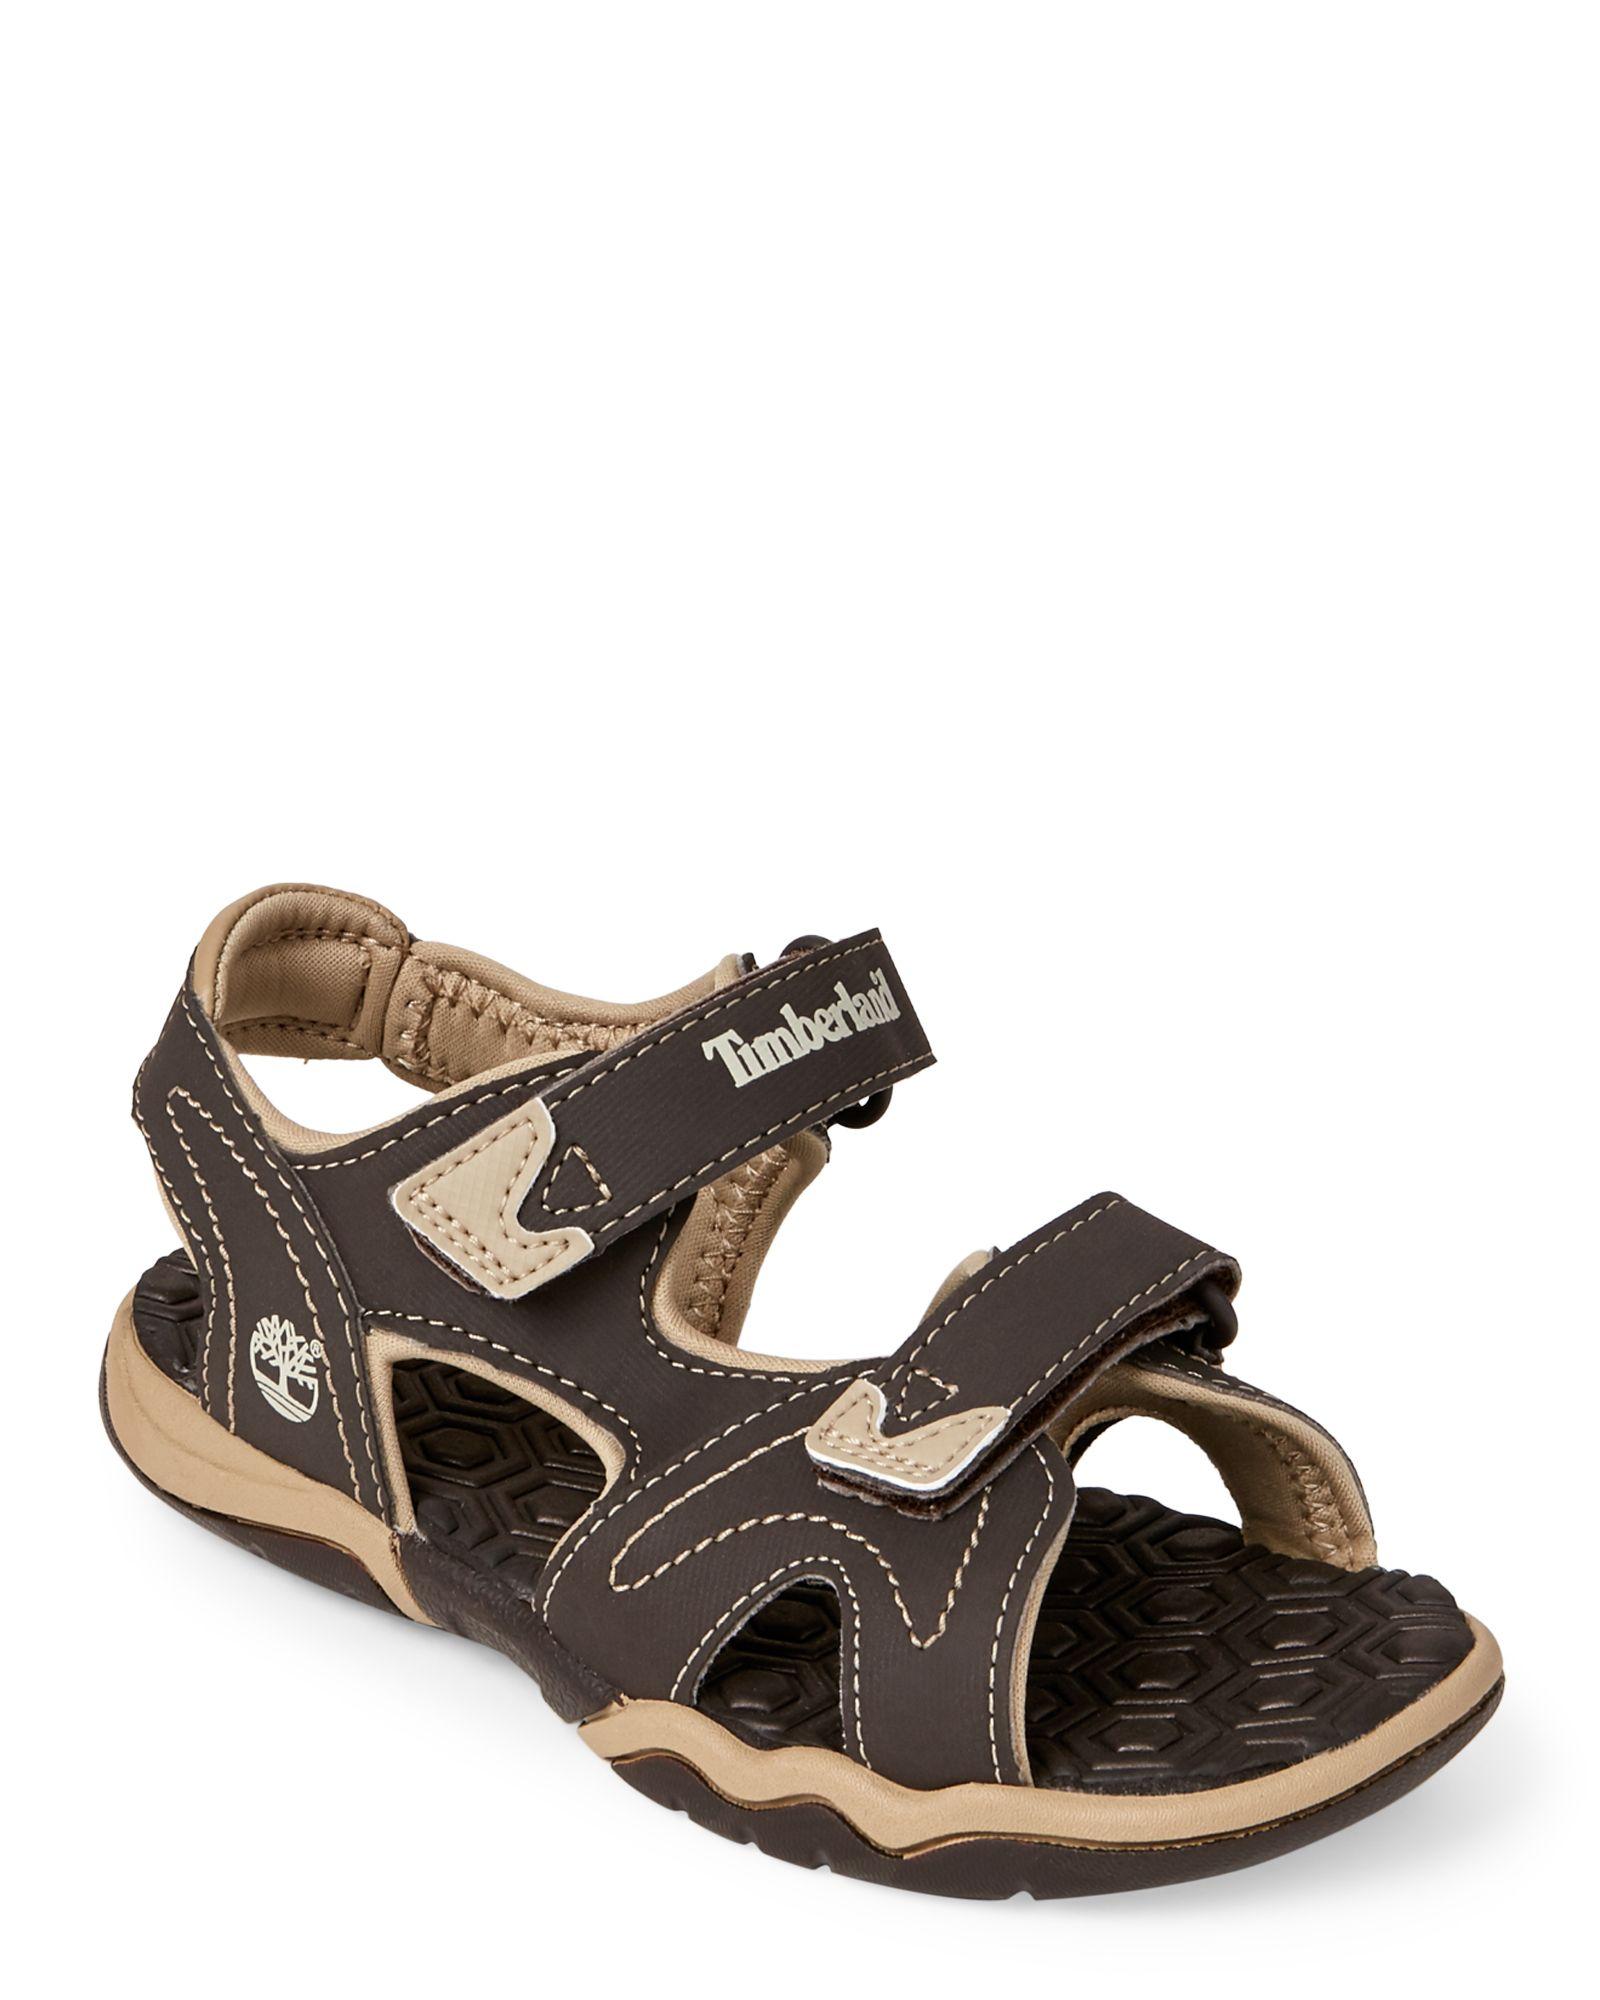 Timberland (Kids Boys) Brown Adventure Seeker 2-Strap Sandals